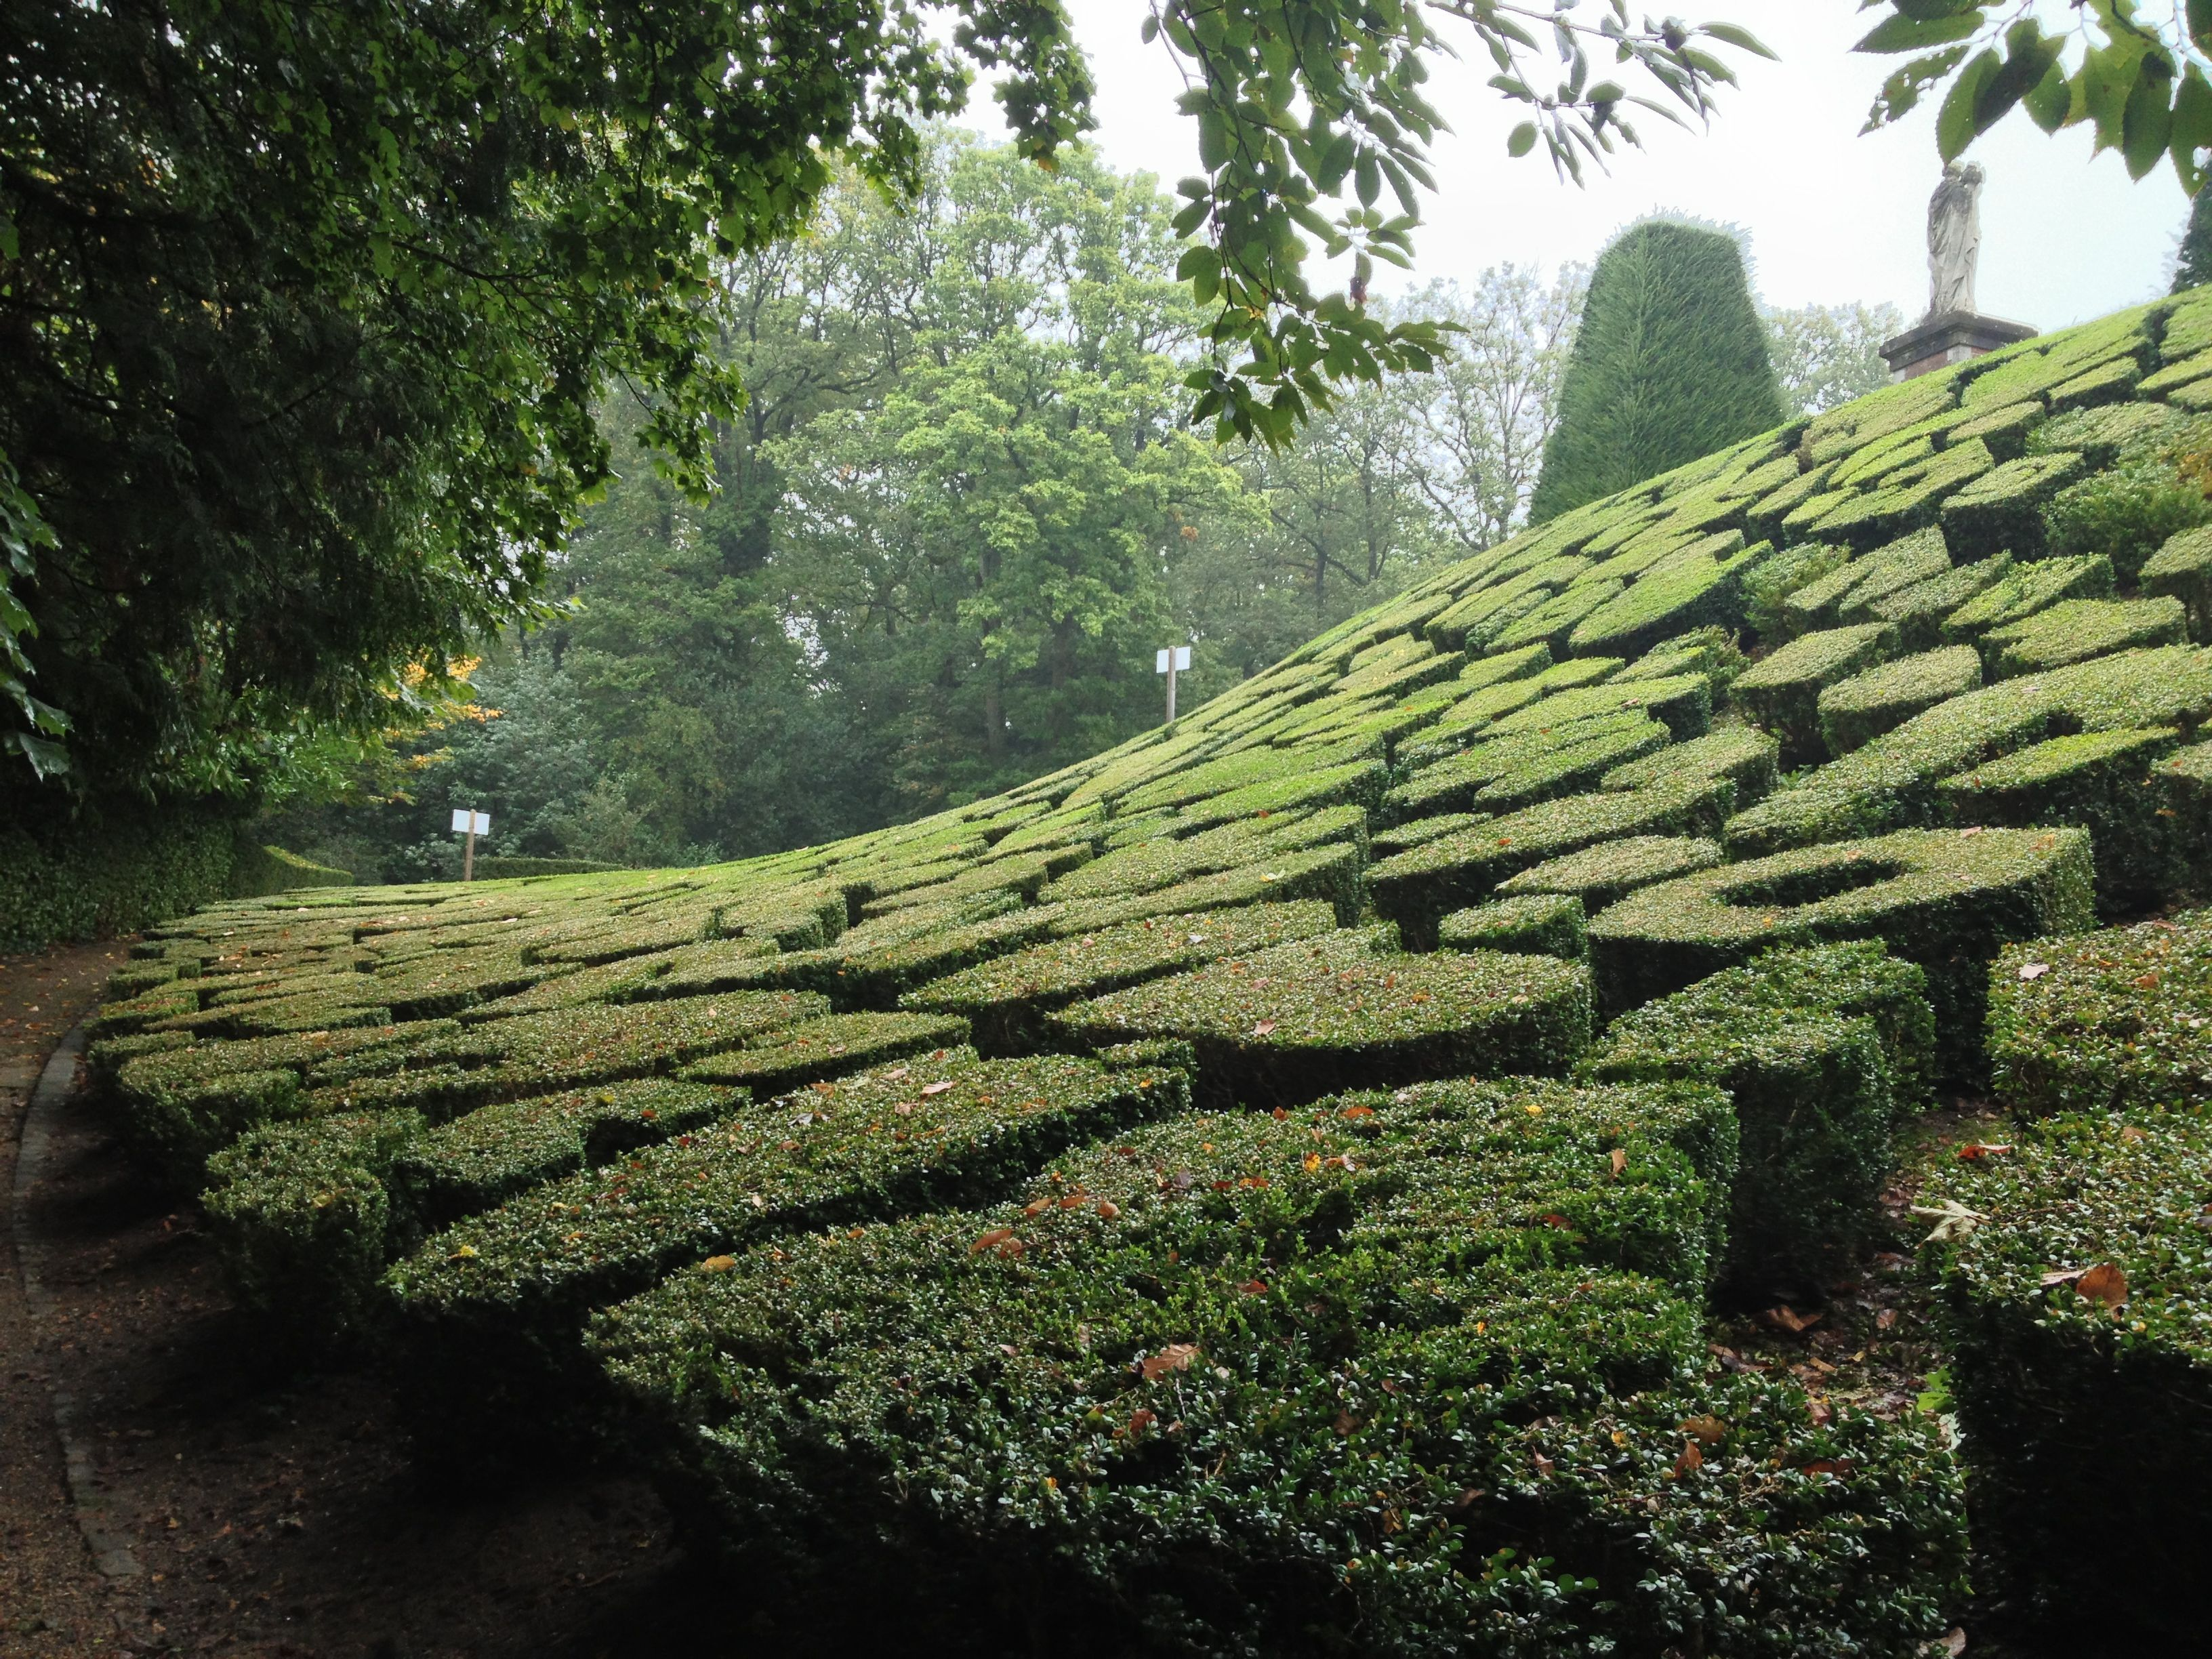 Gardens chateau de breteuil chevreuse france garden ideas